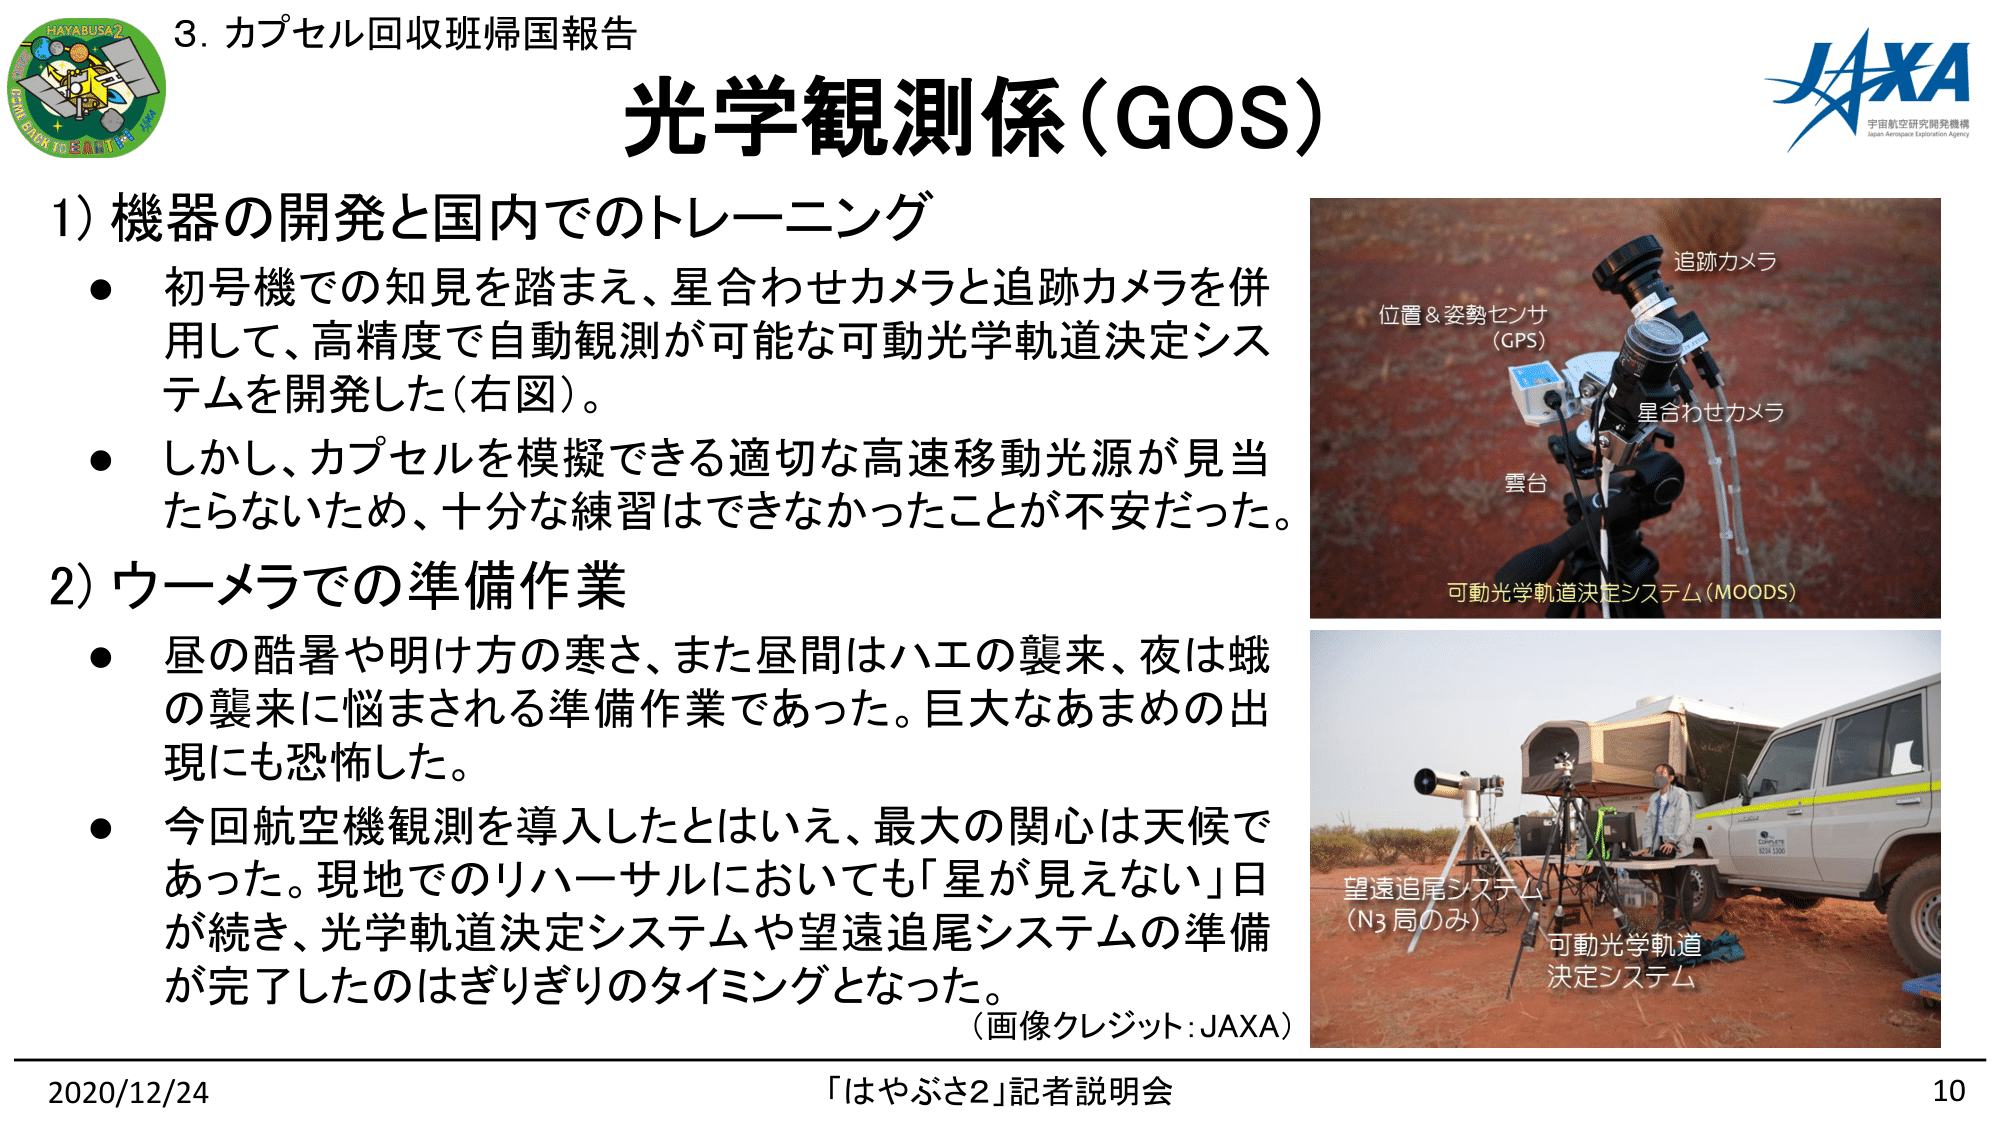 f:id:Imamura:20201224135049p:plain